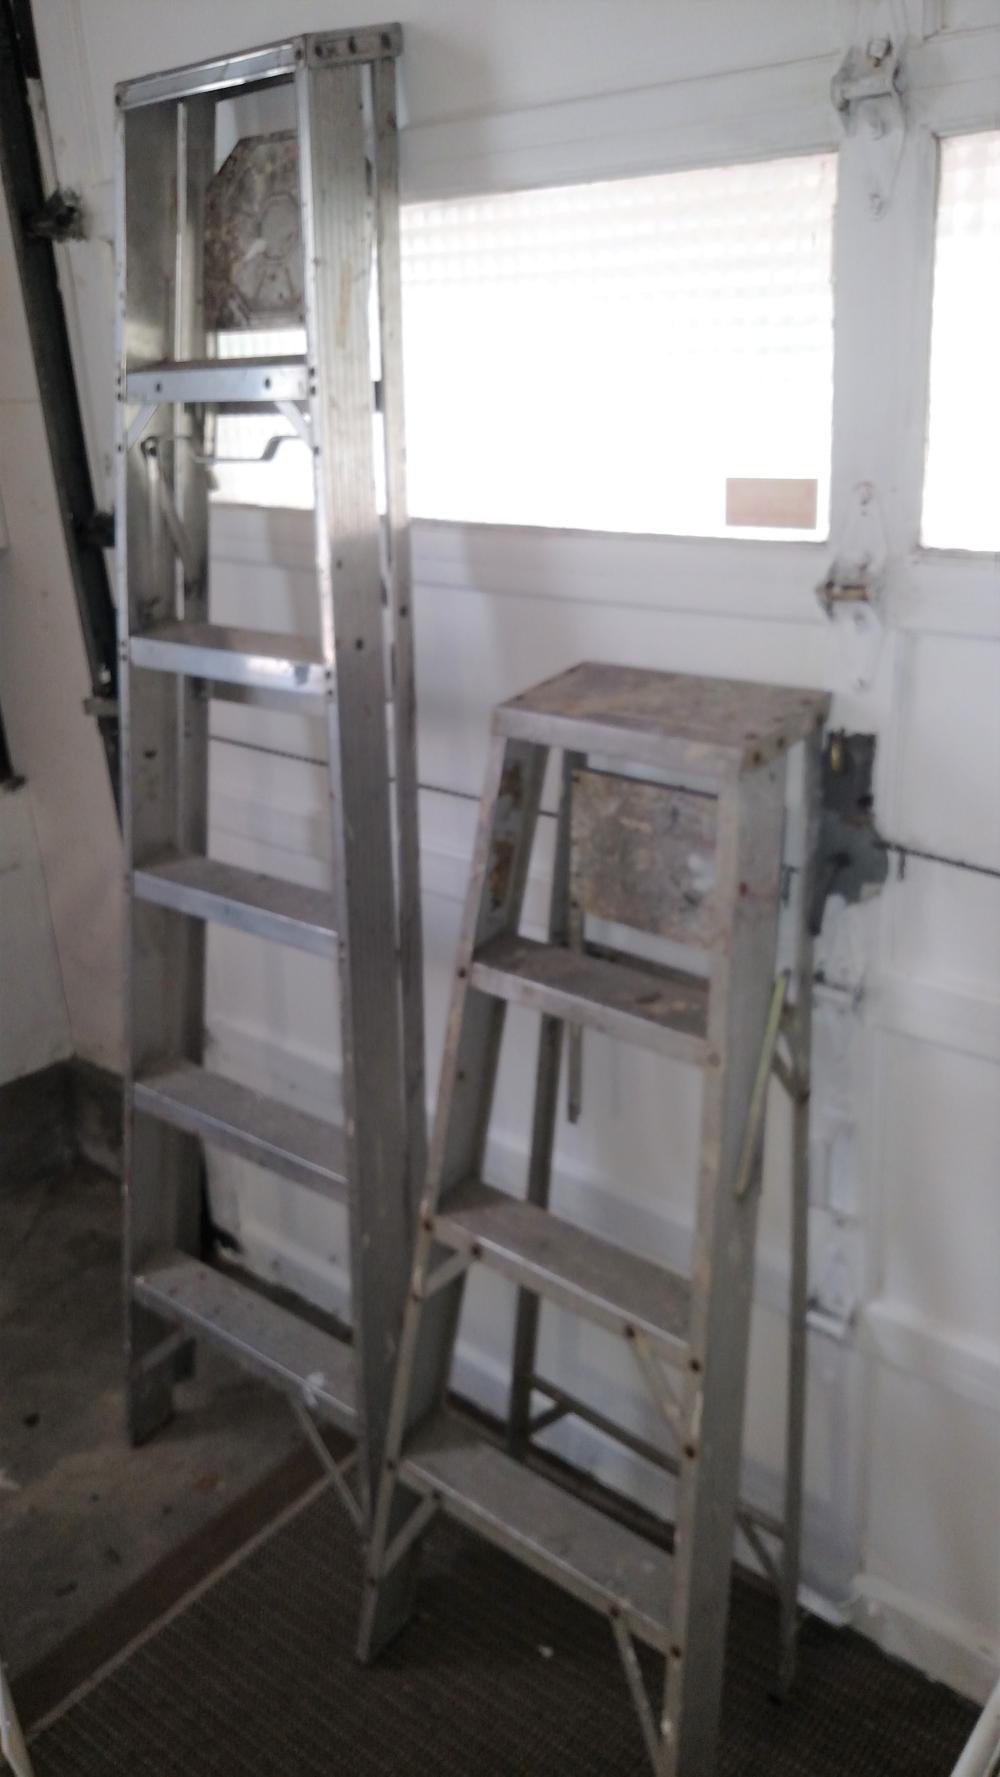 6' and 4' alum ladder